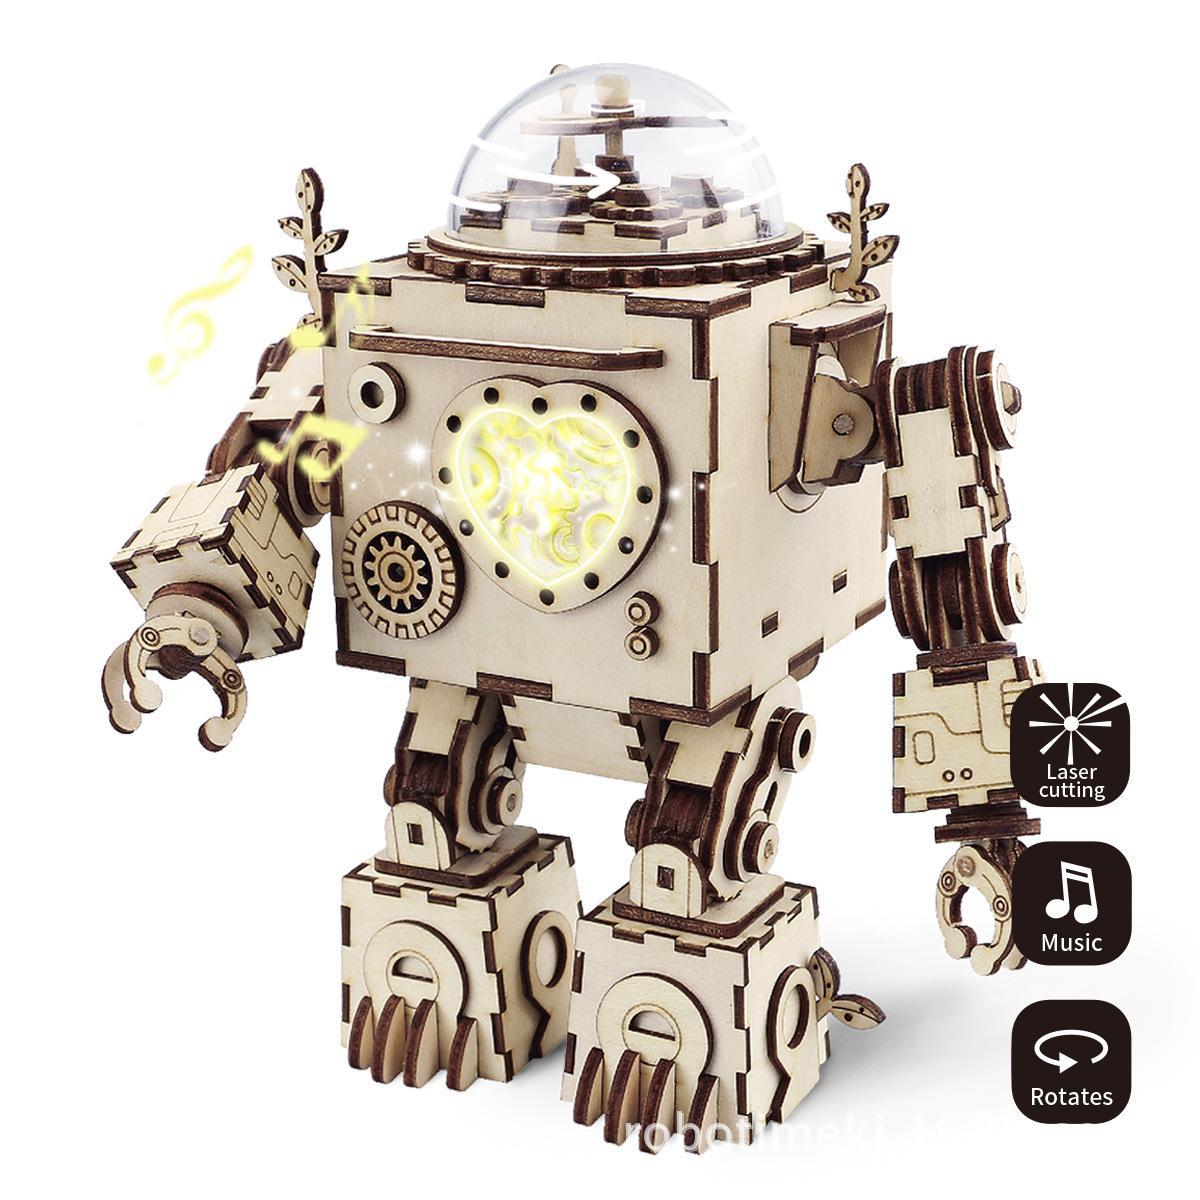 221Pcs puzzle toy Space exploration robot 3D model Music box Home decoration Perfect couple romantic gift Wooden children toy